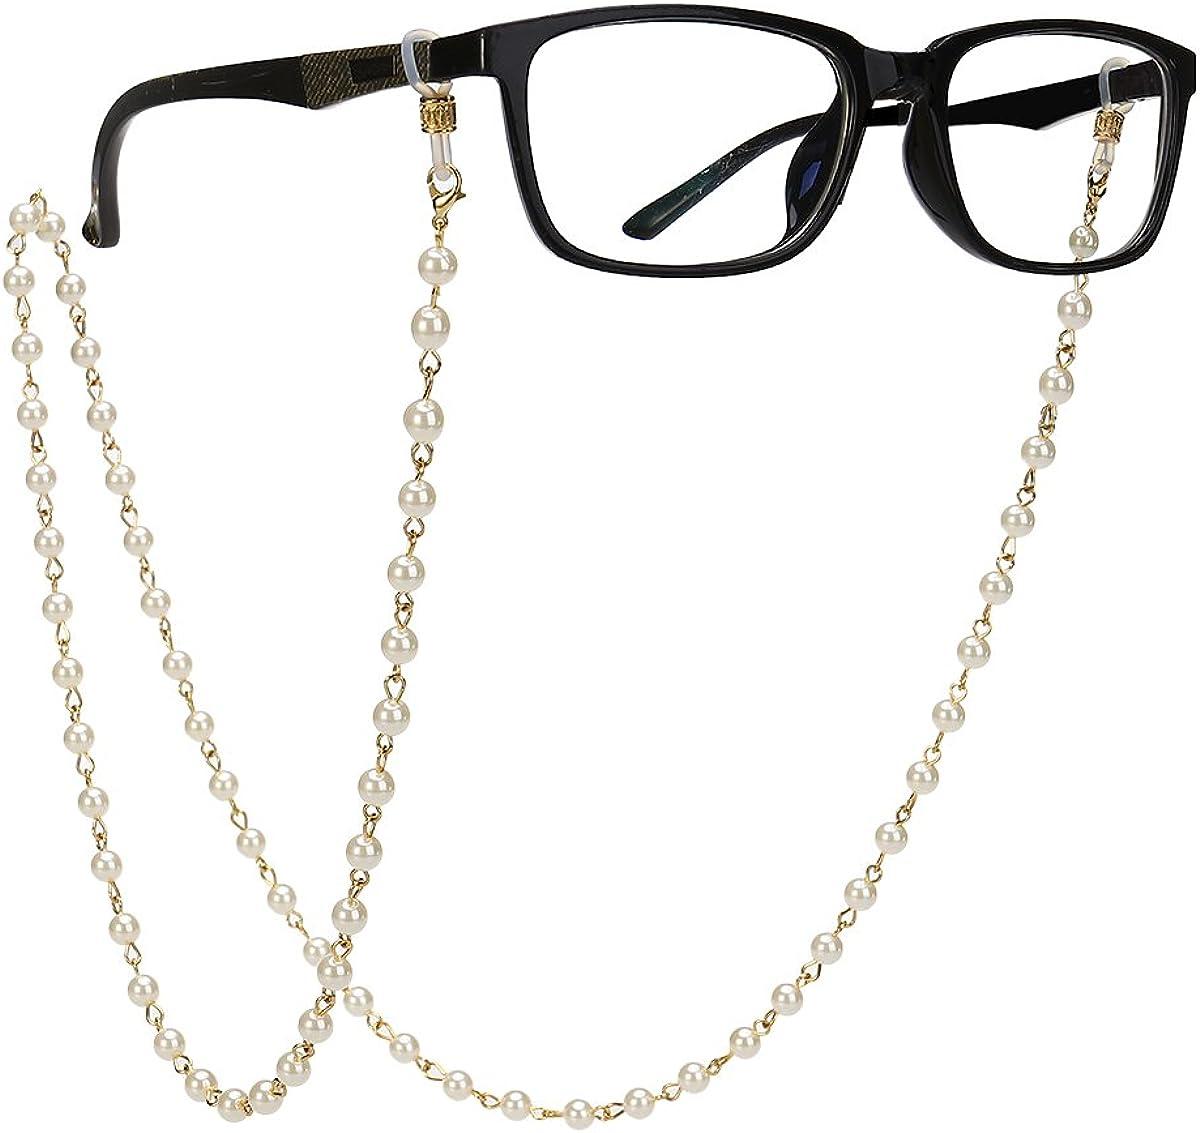 FANTESI 4 pcs Eyeglasses Chain Glasses Chain Non-Slip Metal Glasses Strap Spectacle Chain Glasses Cord Sunglasses Strap Lanyard Eyewear Strap for Women Sports